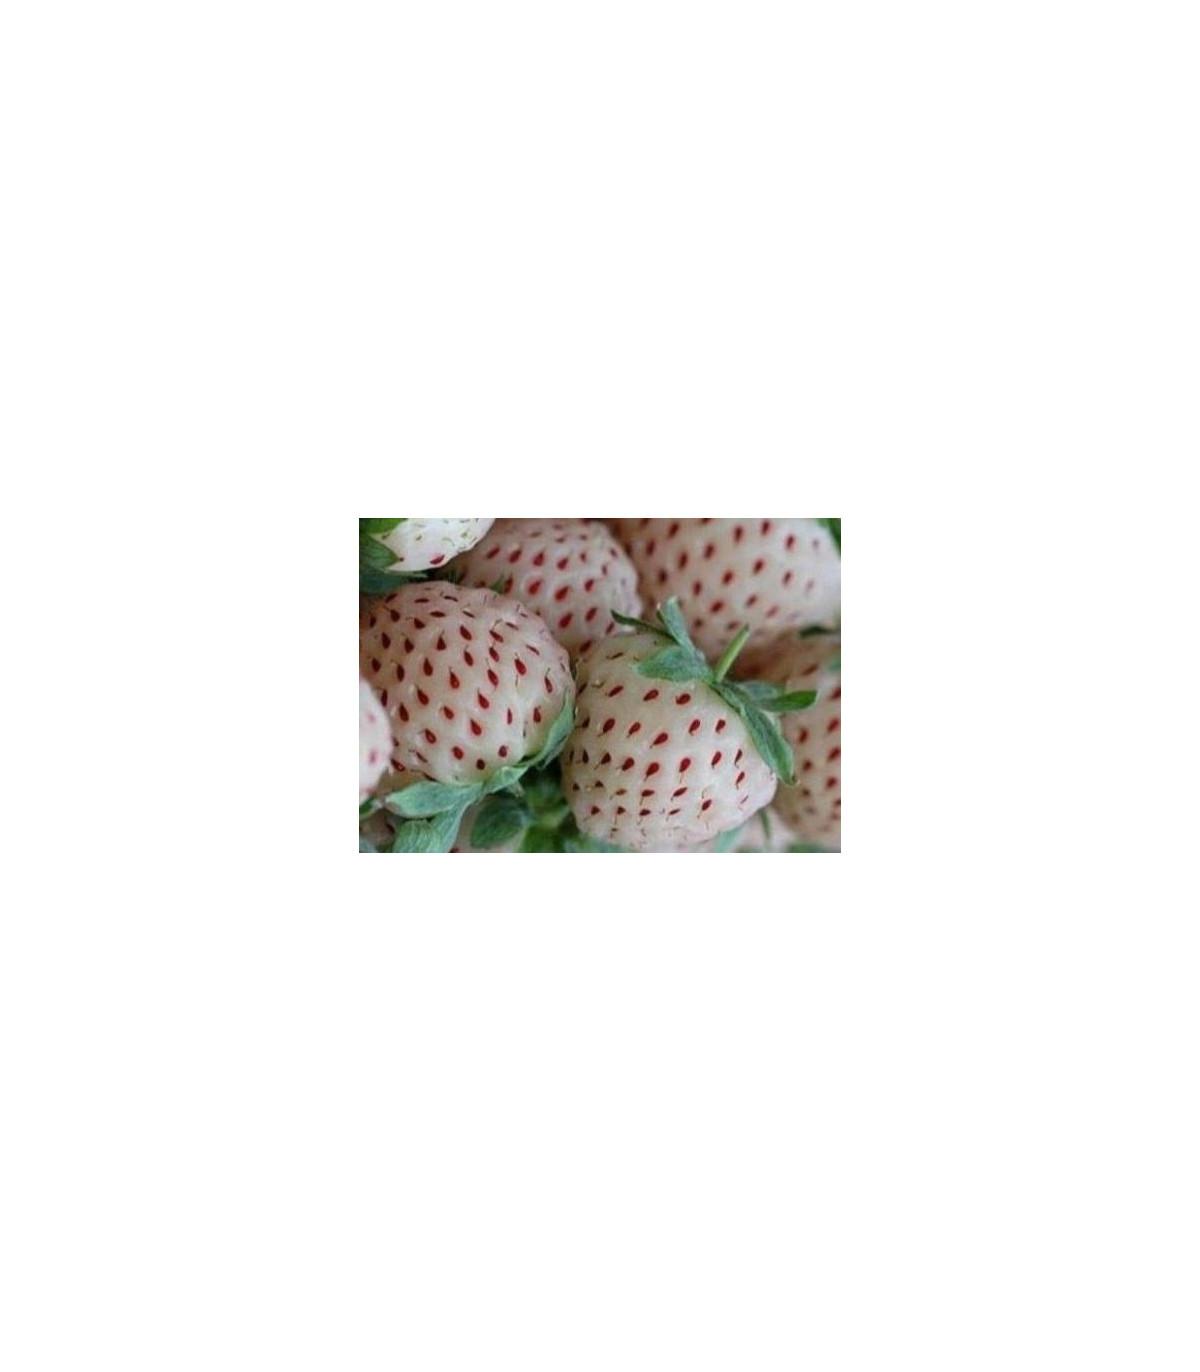 Jahodník bílý - Fragaria vesca - prodej semen jahodníku - 10 ks